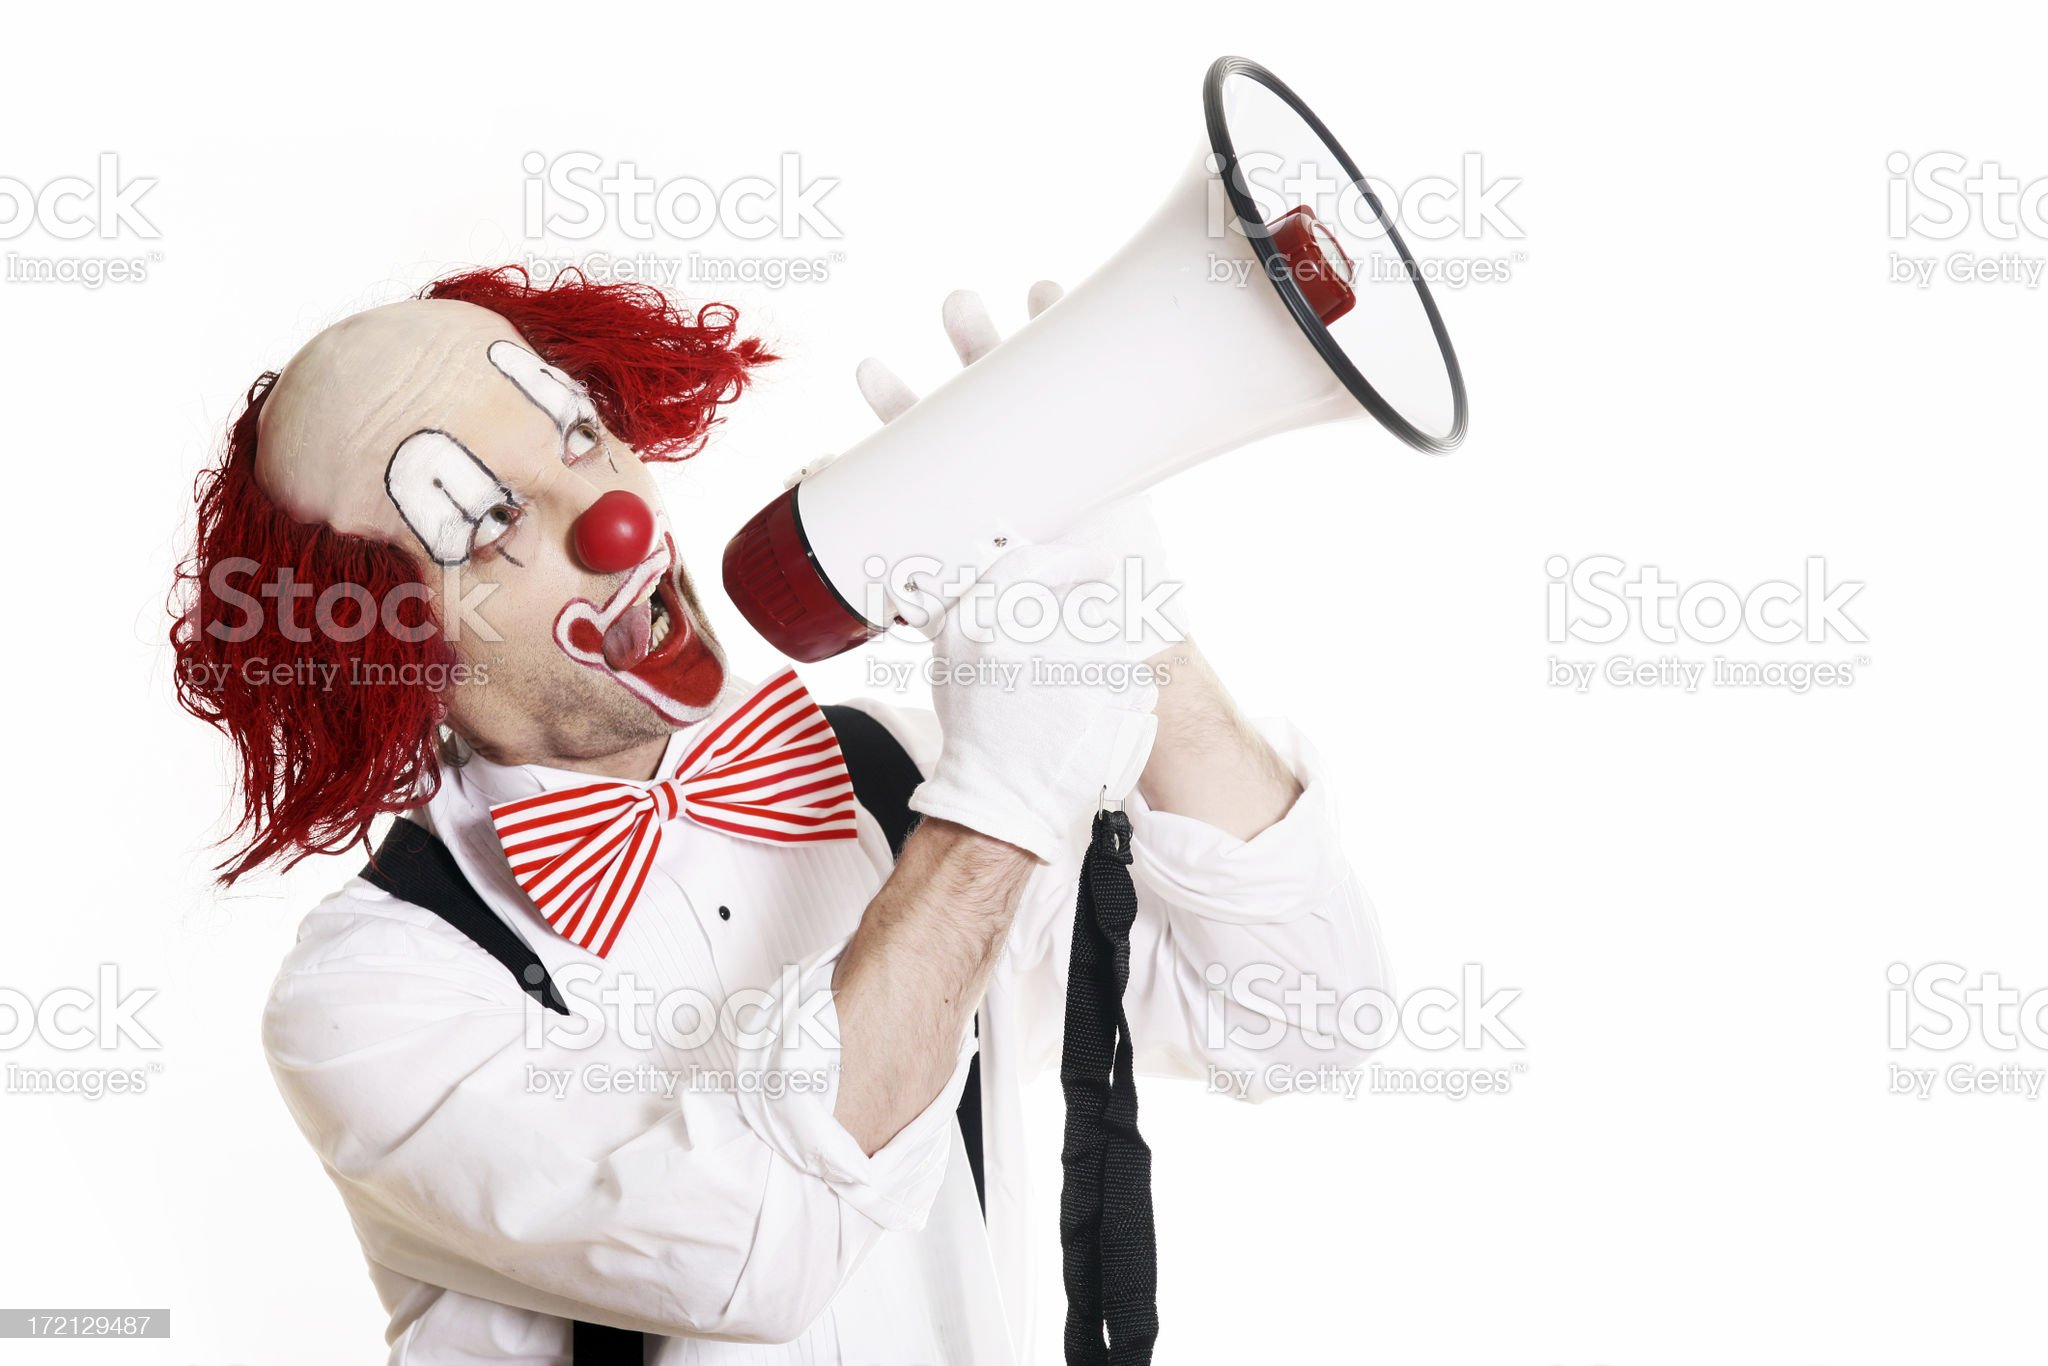 Clown yelling through a megaphone royalty-free stock photo